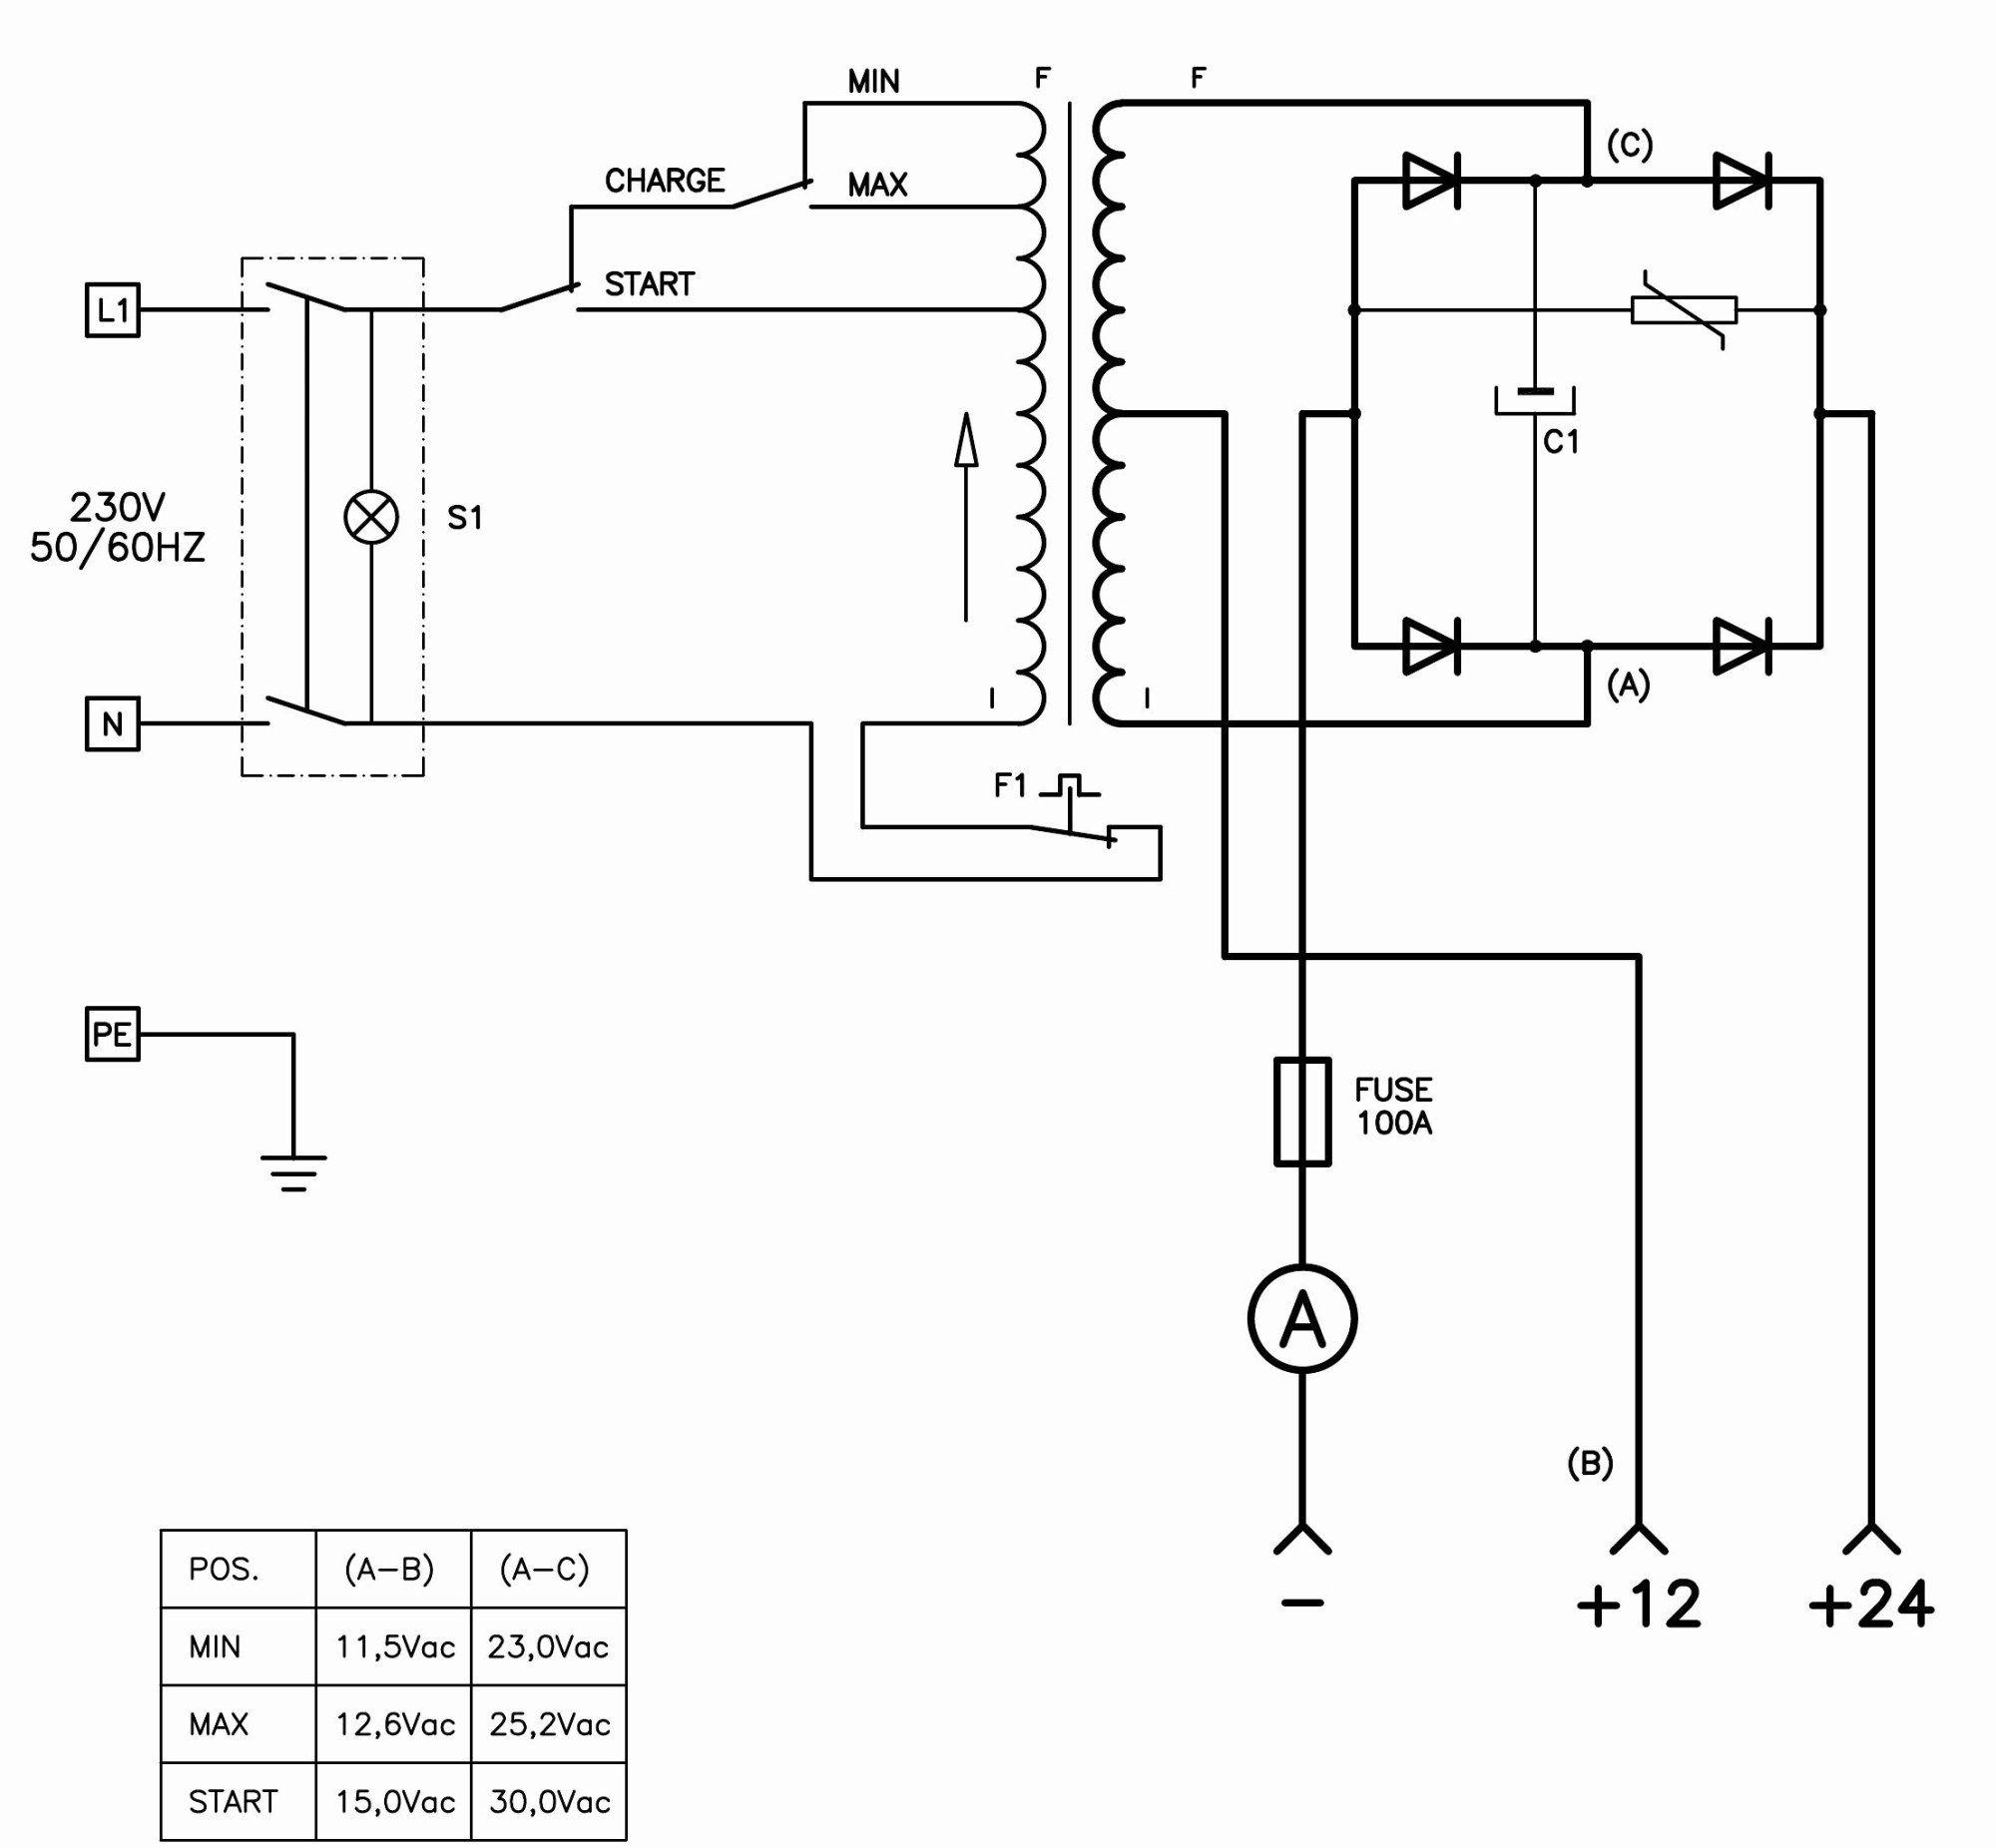 Wiring Diagram For 220 Volt Generator Plug House wiring